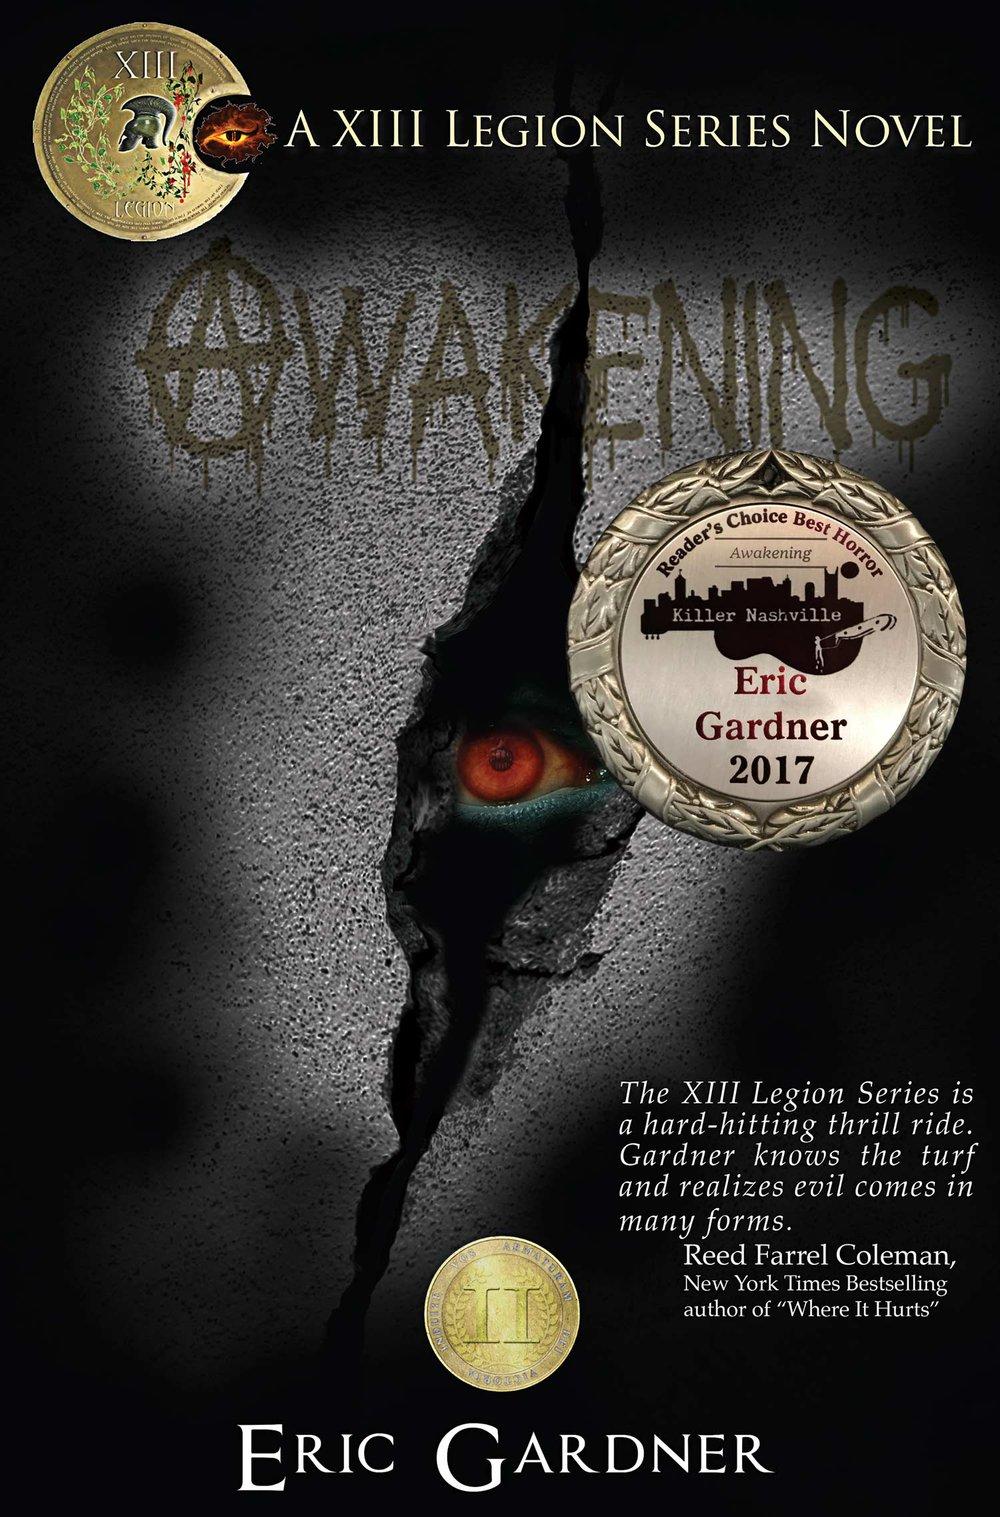 AwakeningCoverWebsite.jpg